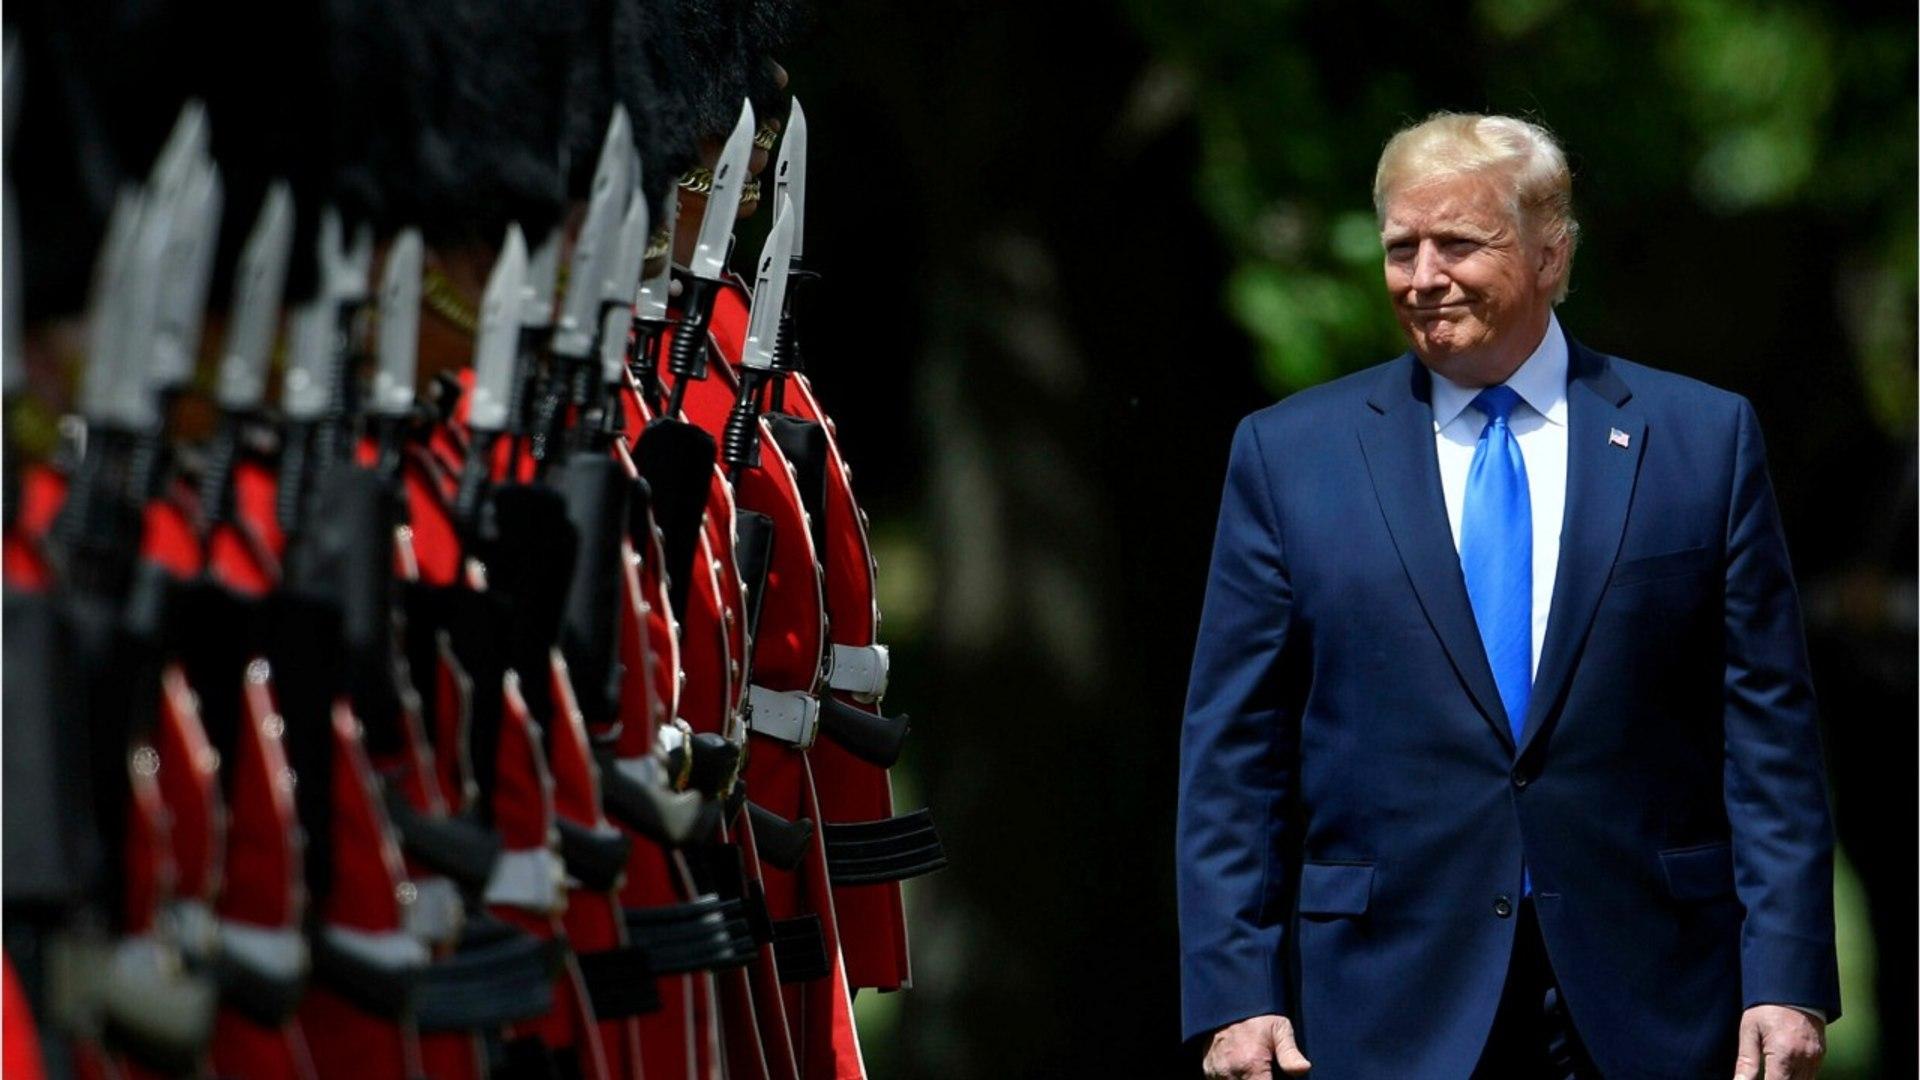 Trump Followed By Trump Balloon In London